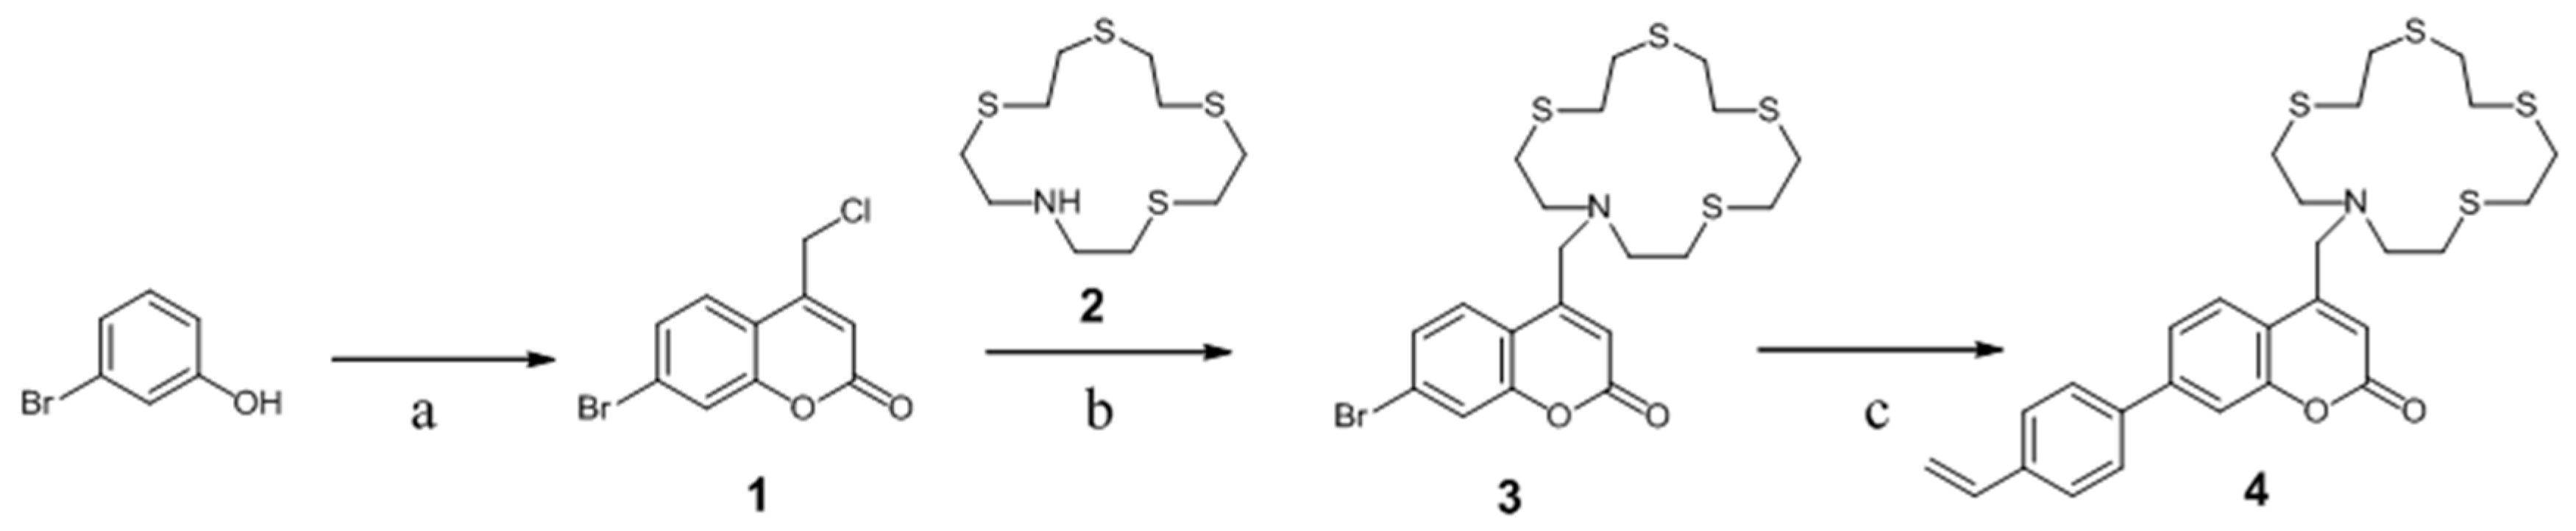 (PDF) Spectroscopic studies on a turn-on fluorescent